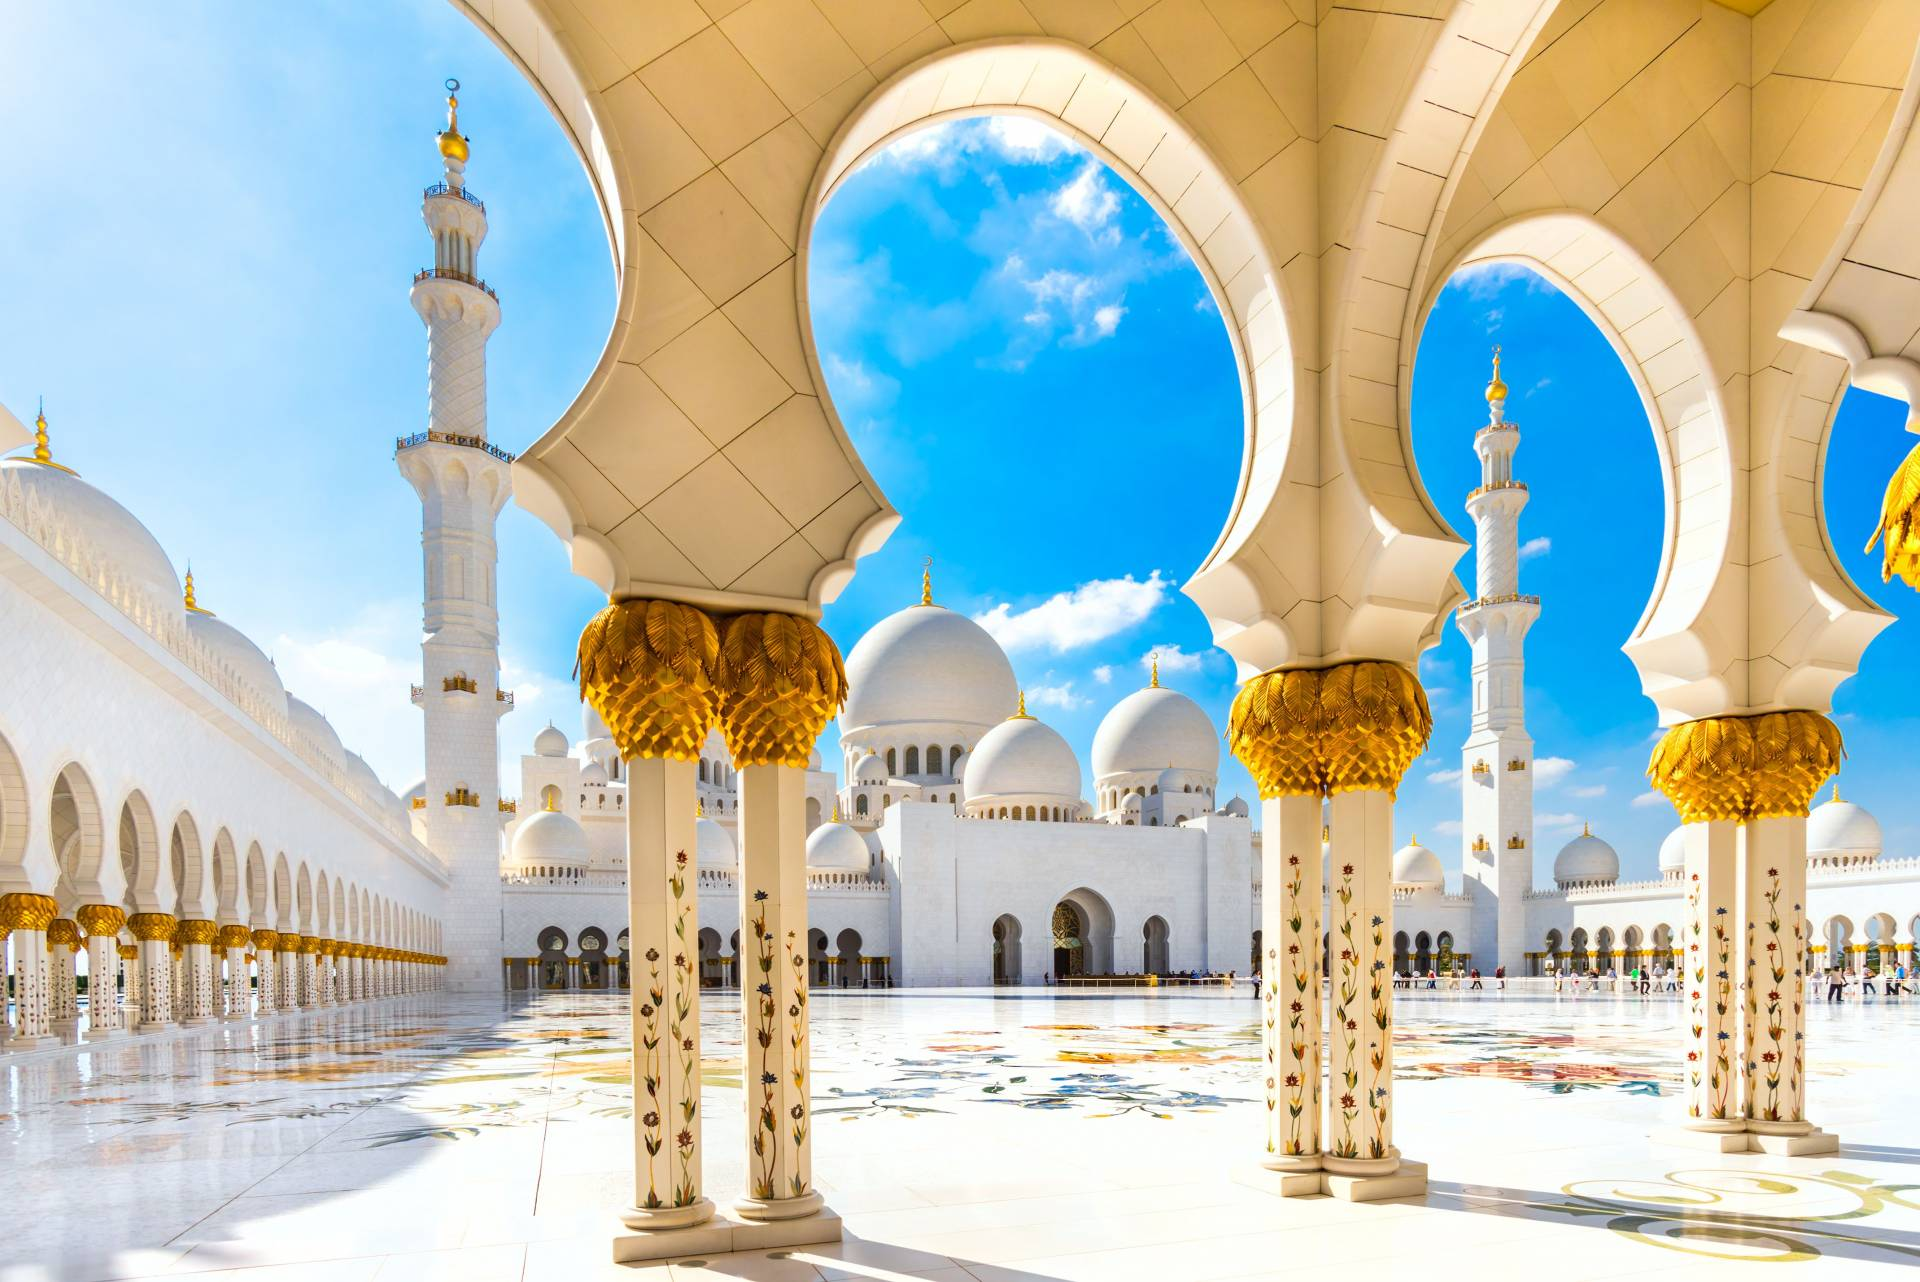 Emirate femeie datand caut femei care cauta barbati doljevac